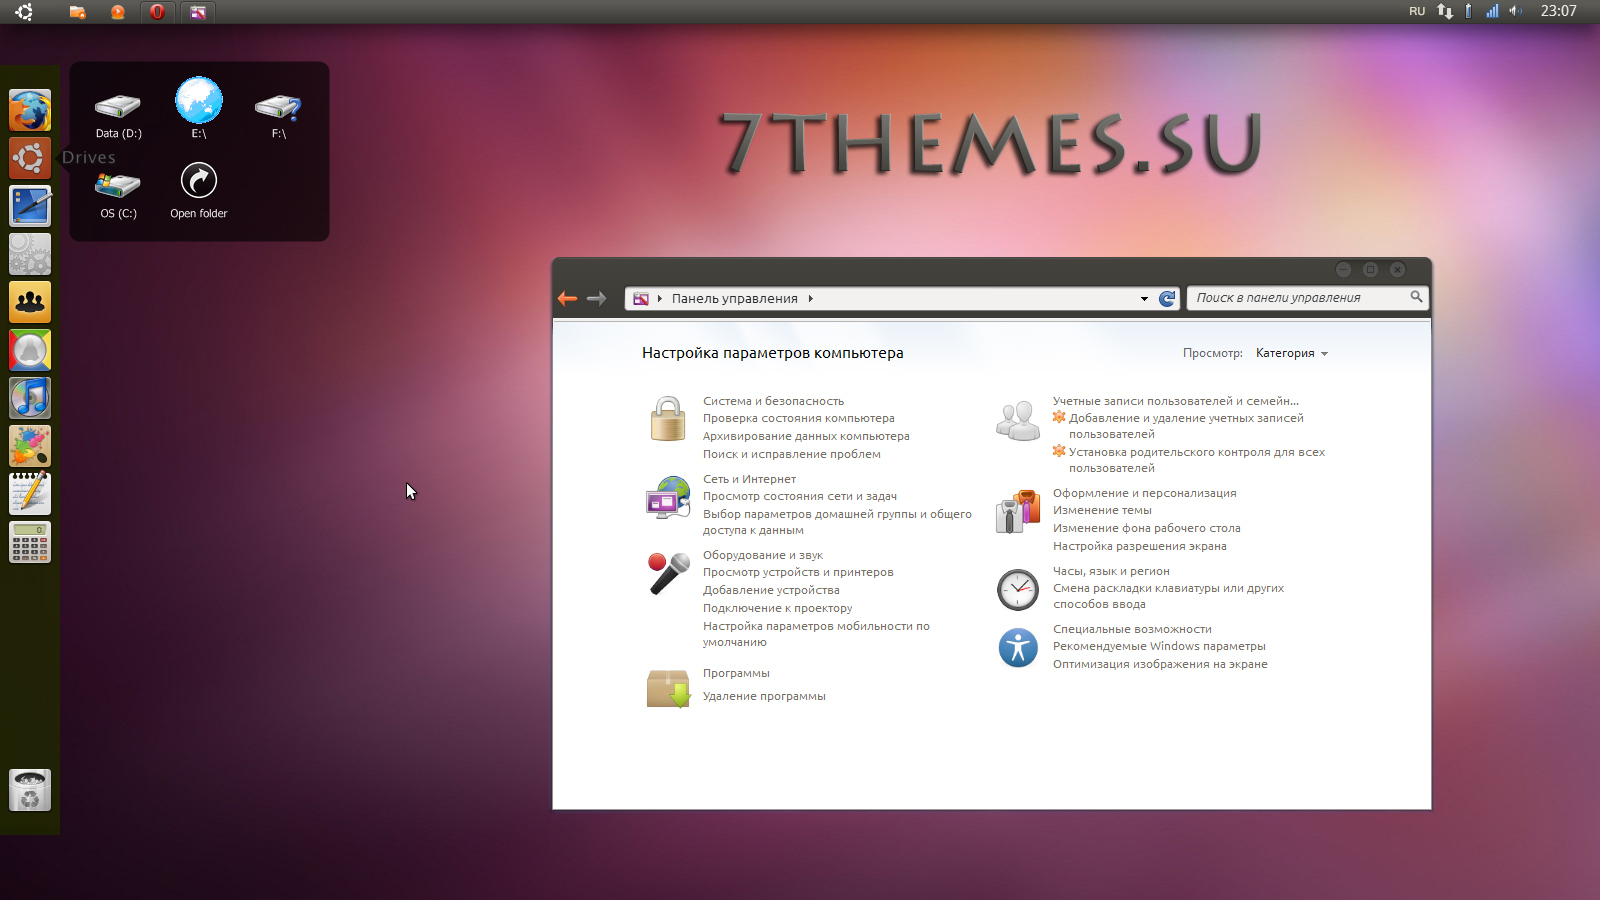 Сервер игры linux